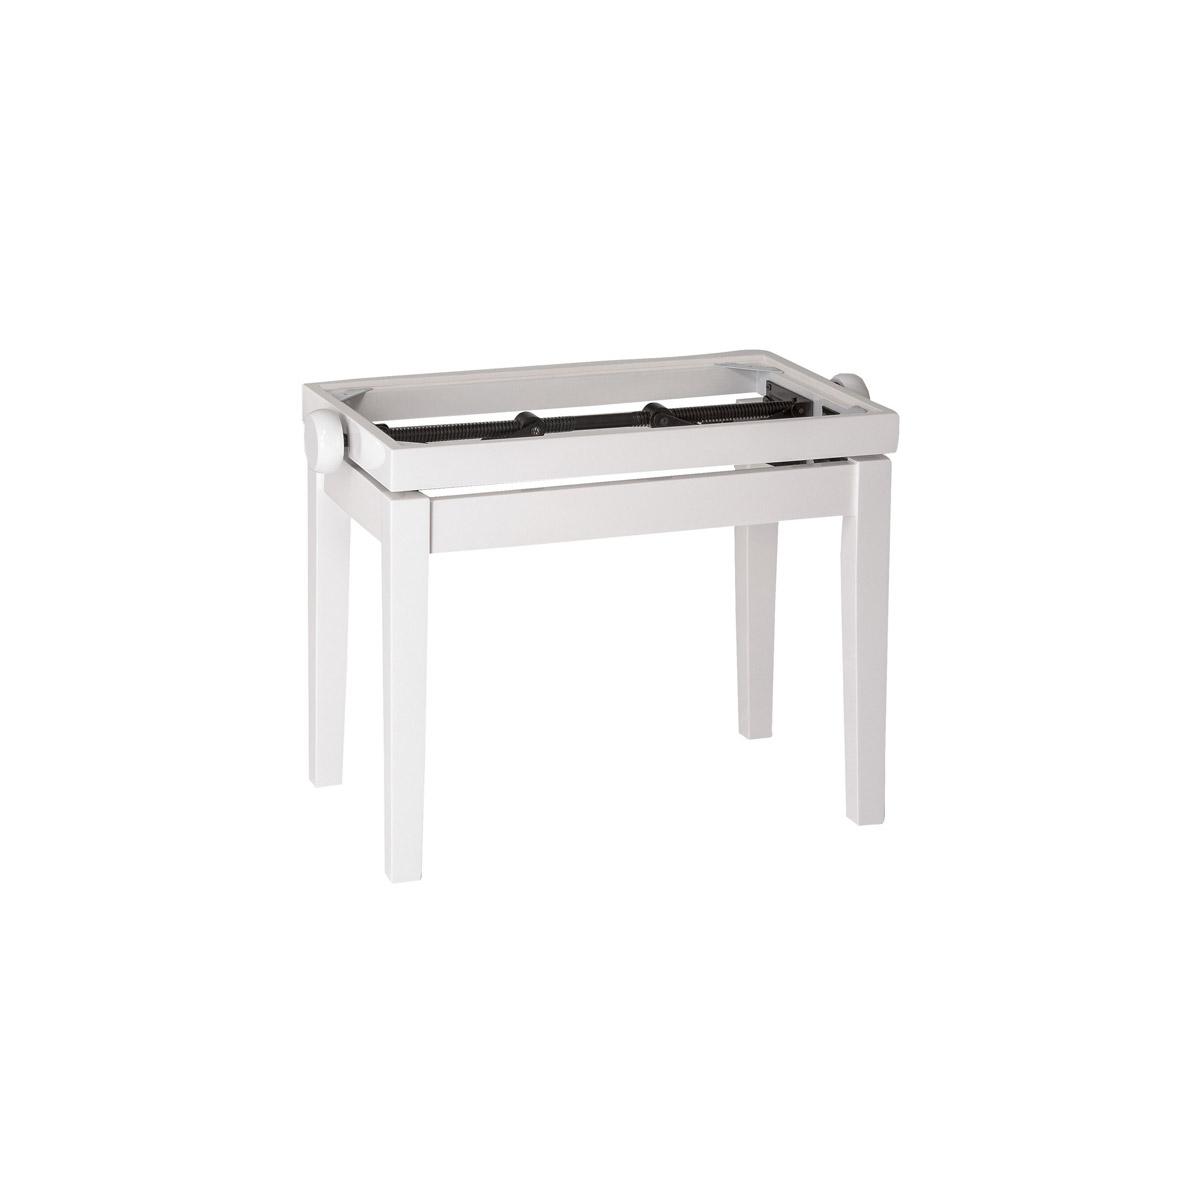 banquette de piano cerise mat avec simili cuir noir. Black Bedroom Furniture Sets. Home Design Ideas